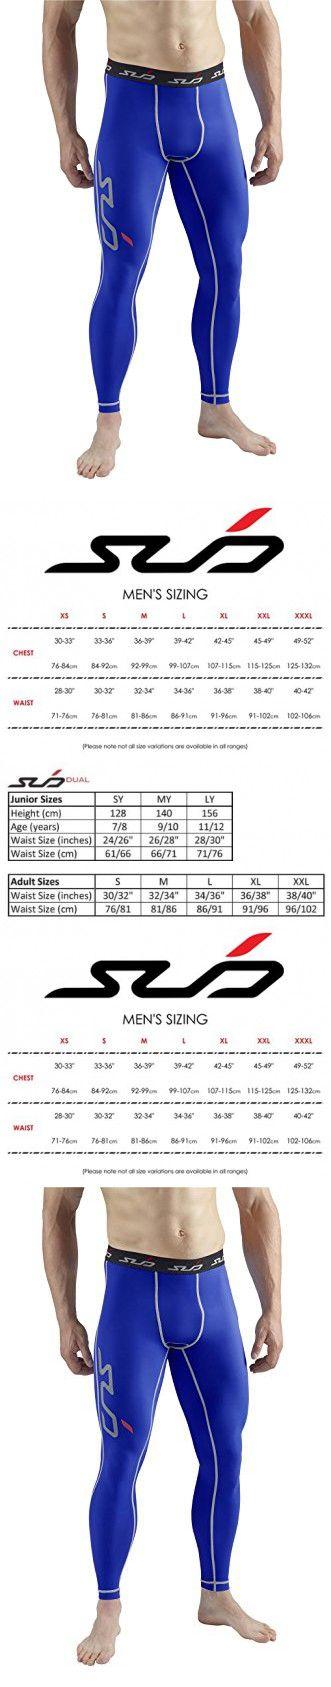 SUB Sports DUAL (All Season) Mens Compression Leggings / Pants - Base Layer Tights - Royal - L